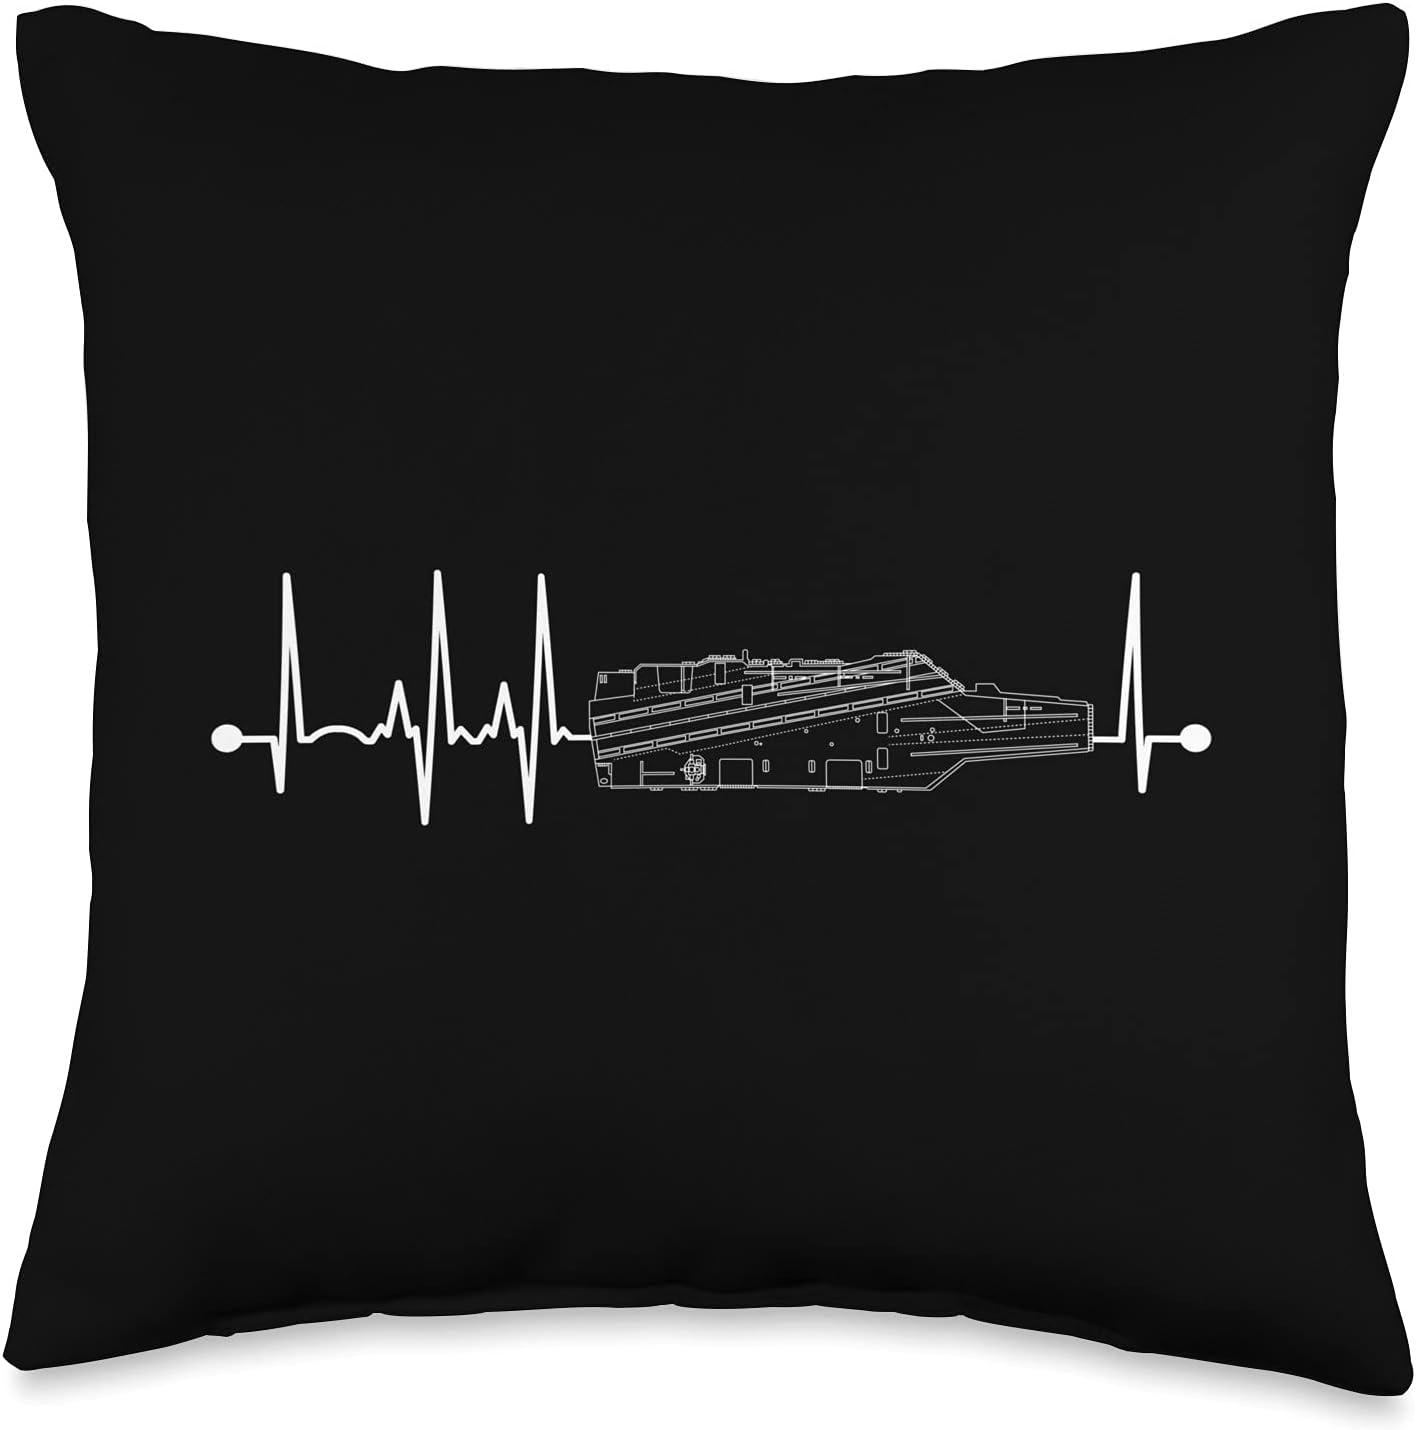 The Salty Veteran Aircraft Soldering Carrier EKG Heartbeat Pulse Navy Regular store Mili